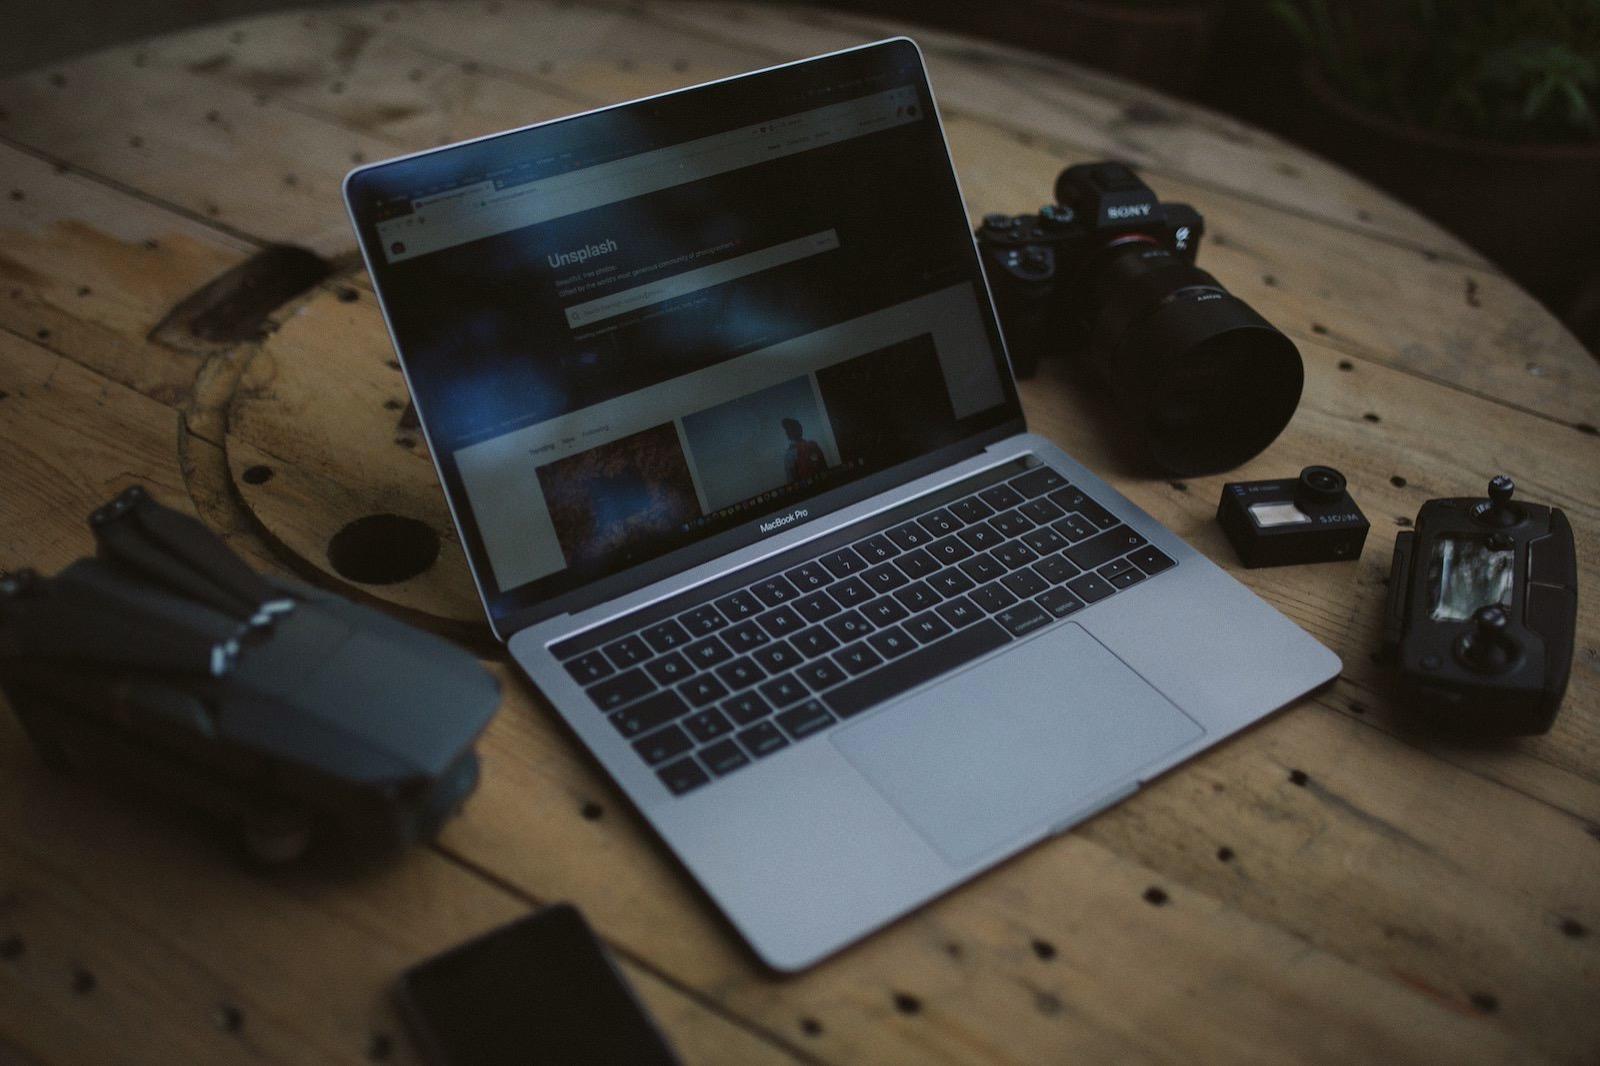 Ken suarez 654777 unsplash macbook pro with cameras